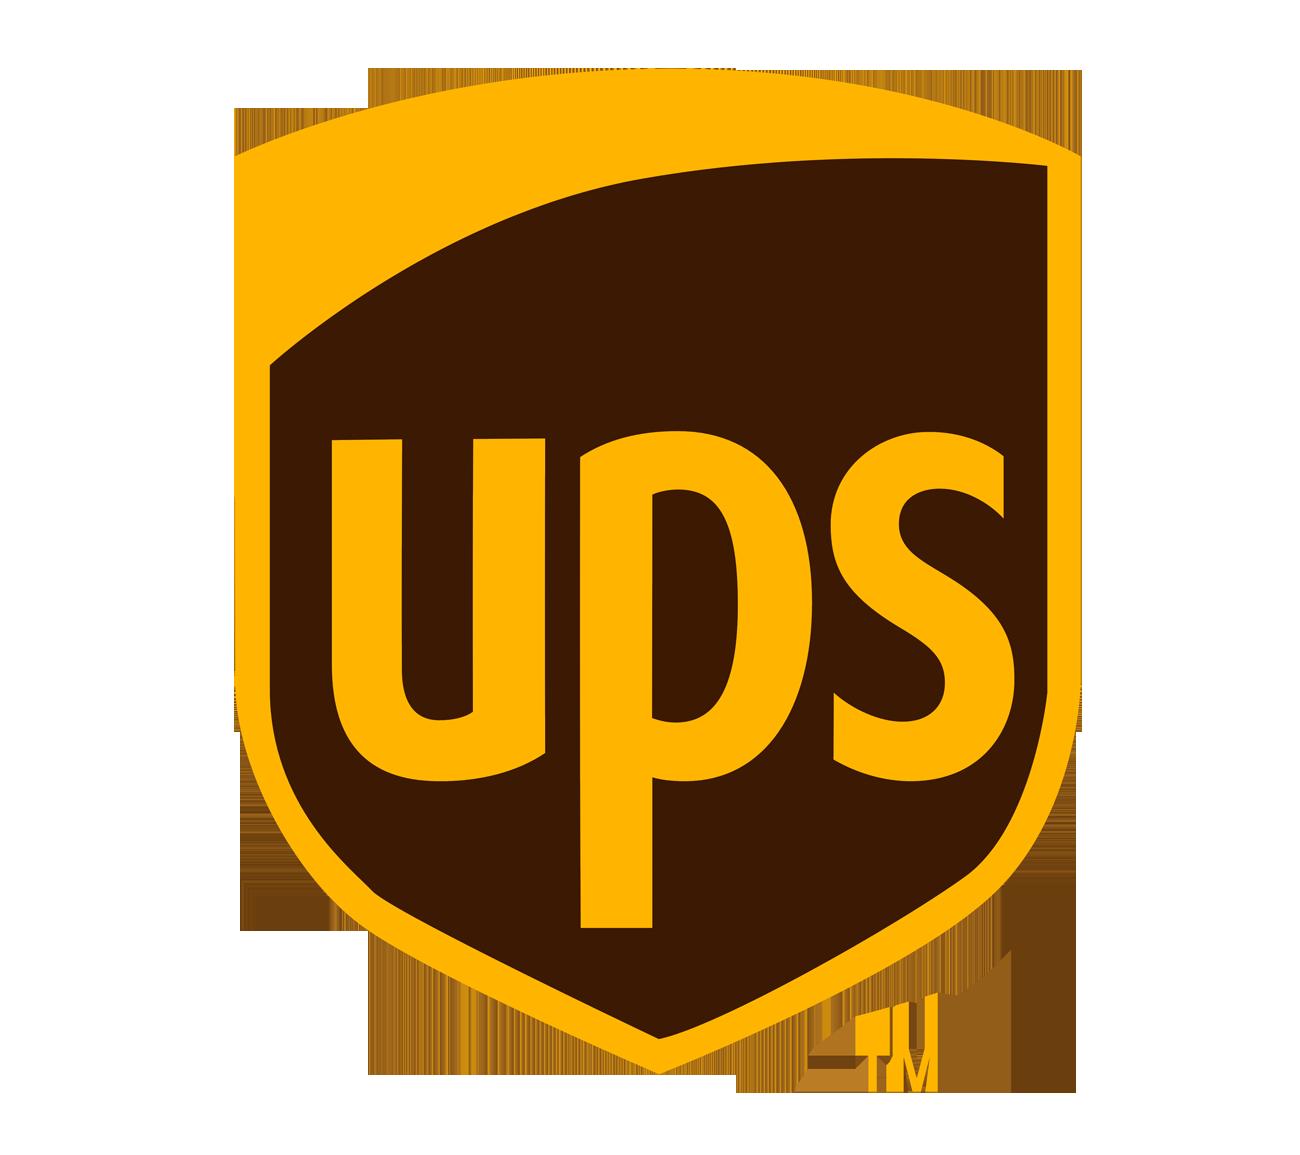 Ups logo ups symbol meaning history and evolution ups logo buycottarizona Image collections